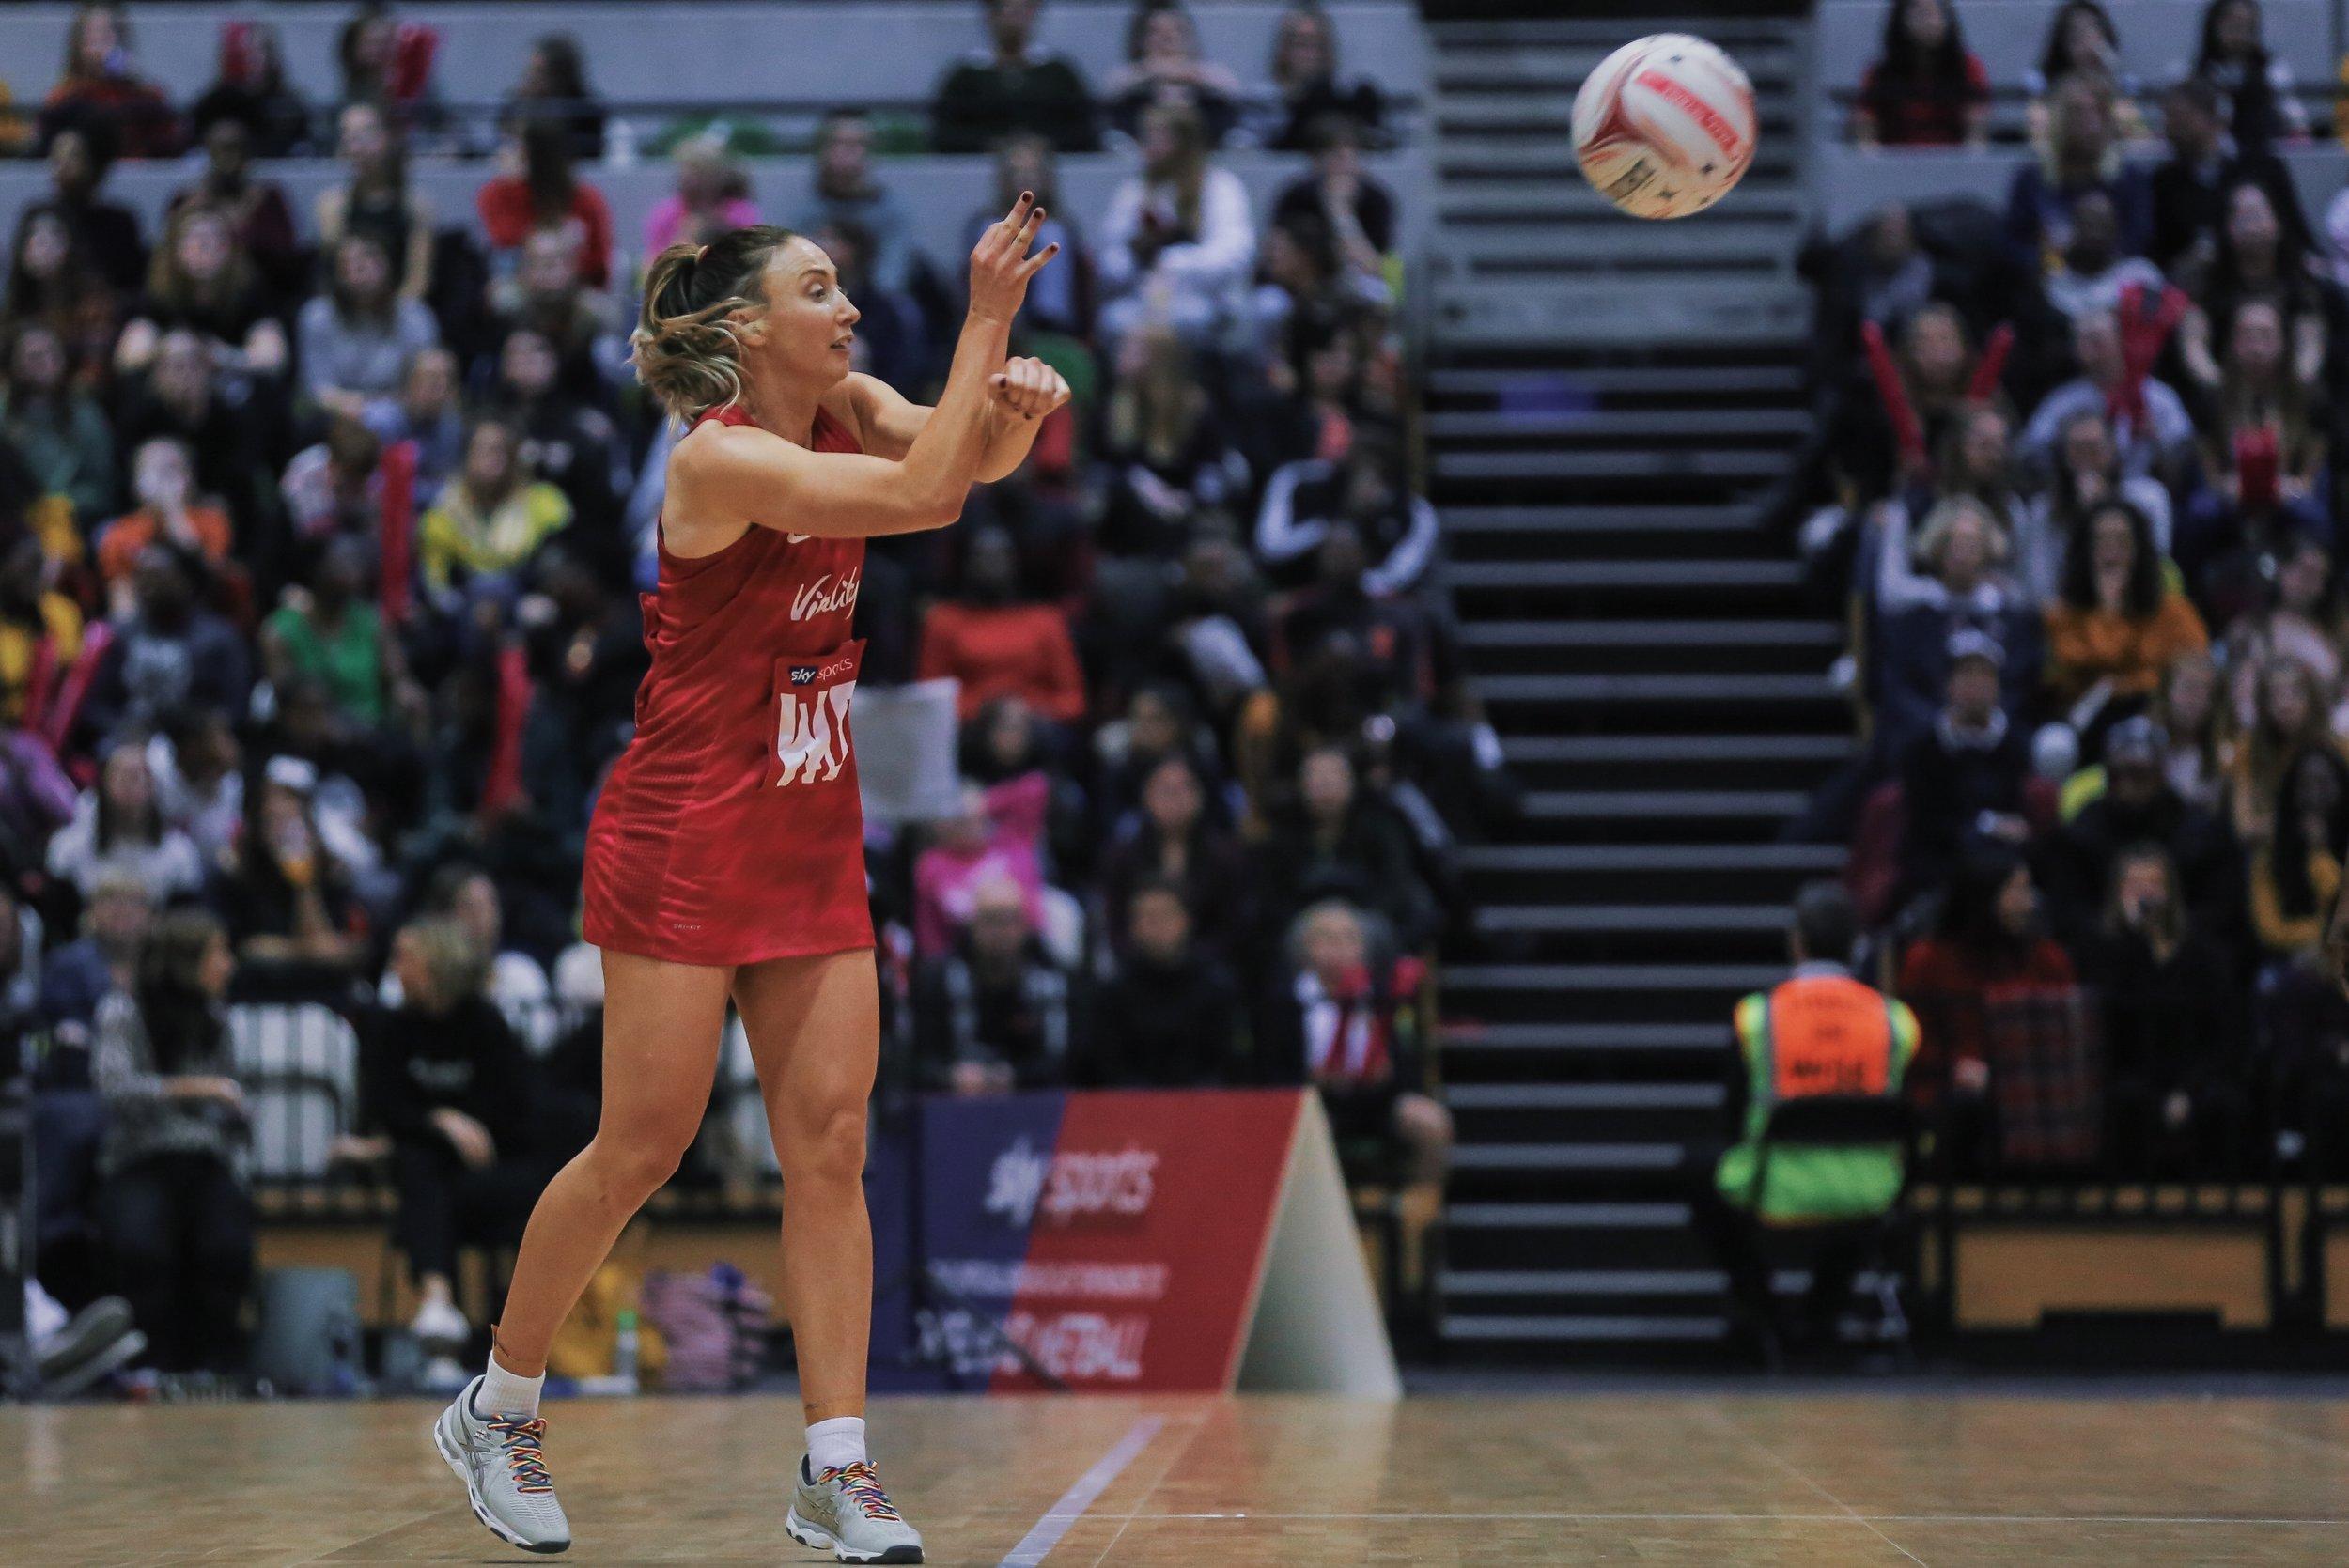 womens-netball-sport-england-uganda-international-series-22.jpg